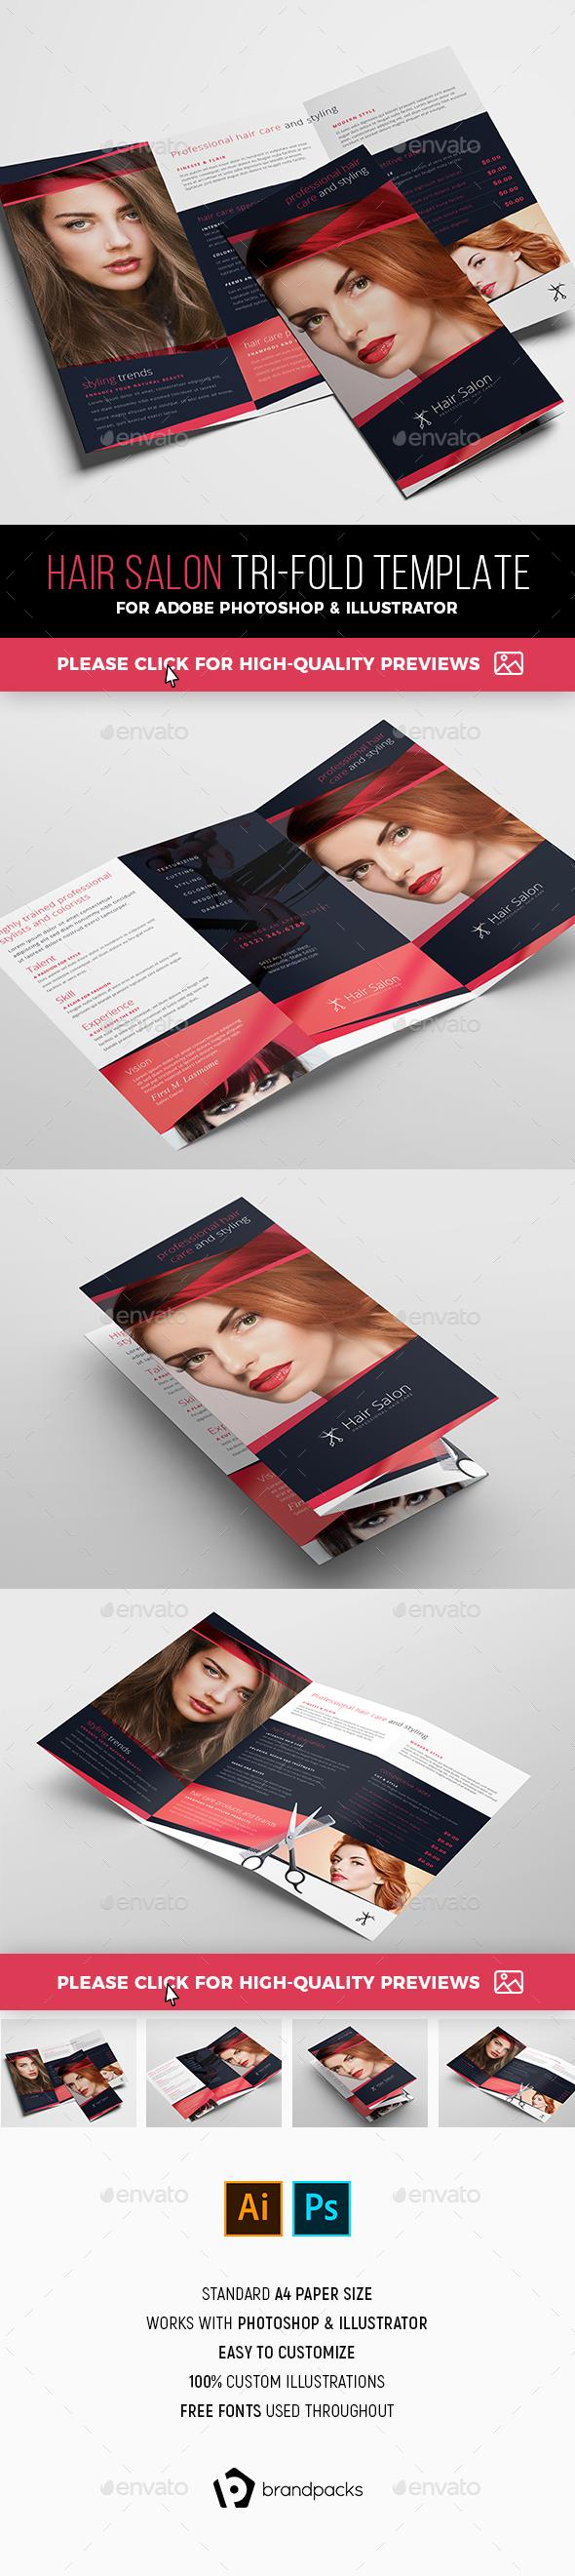 Hair Salon Tri-Fold Brochure Template - Corporate Brochures